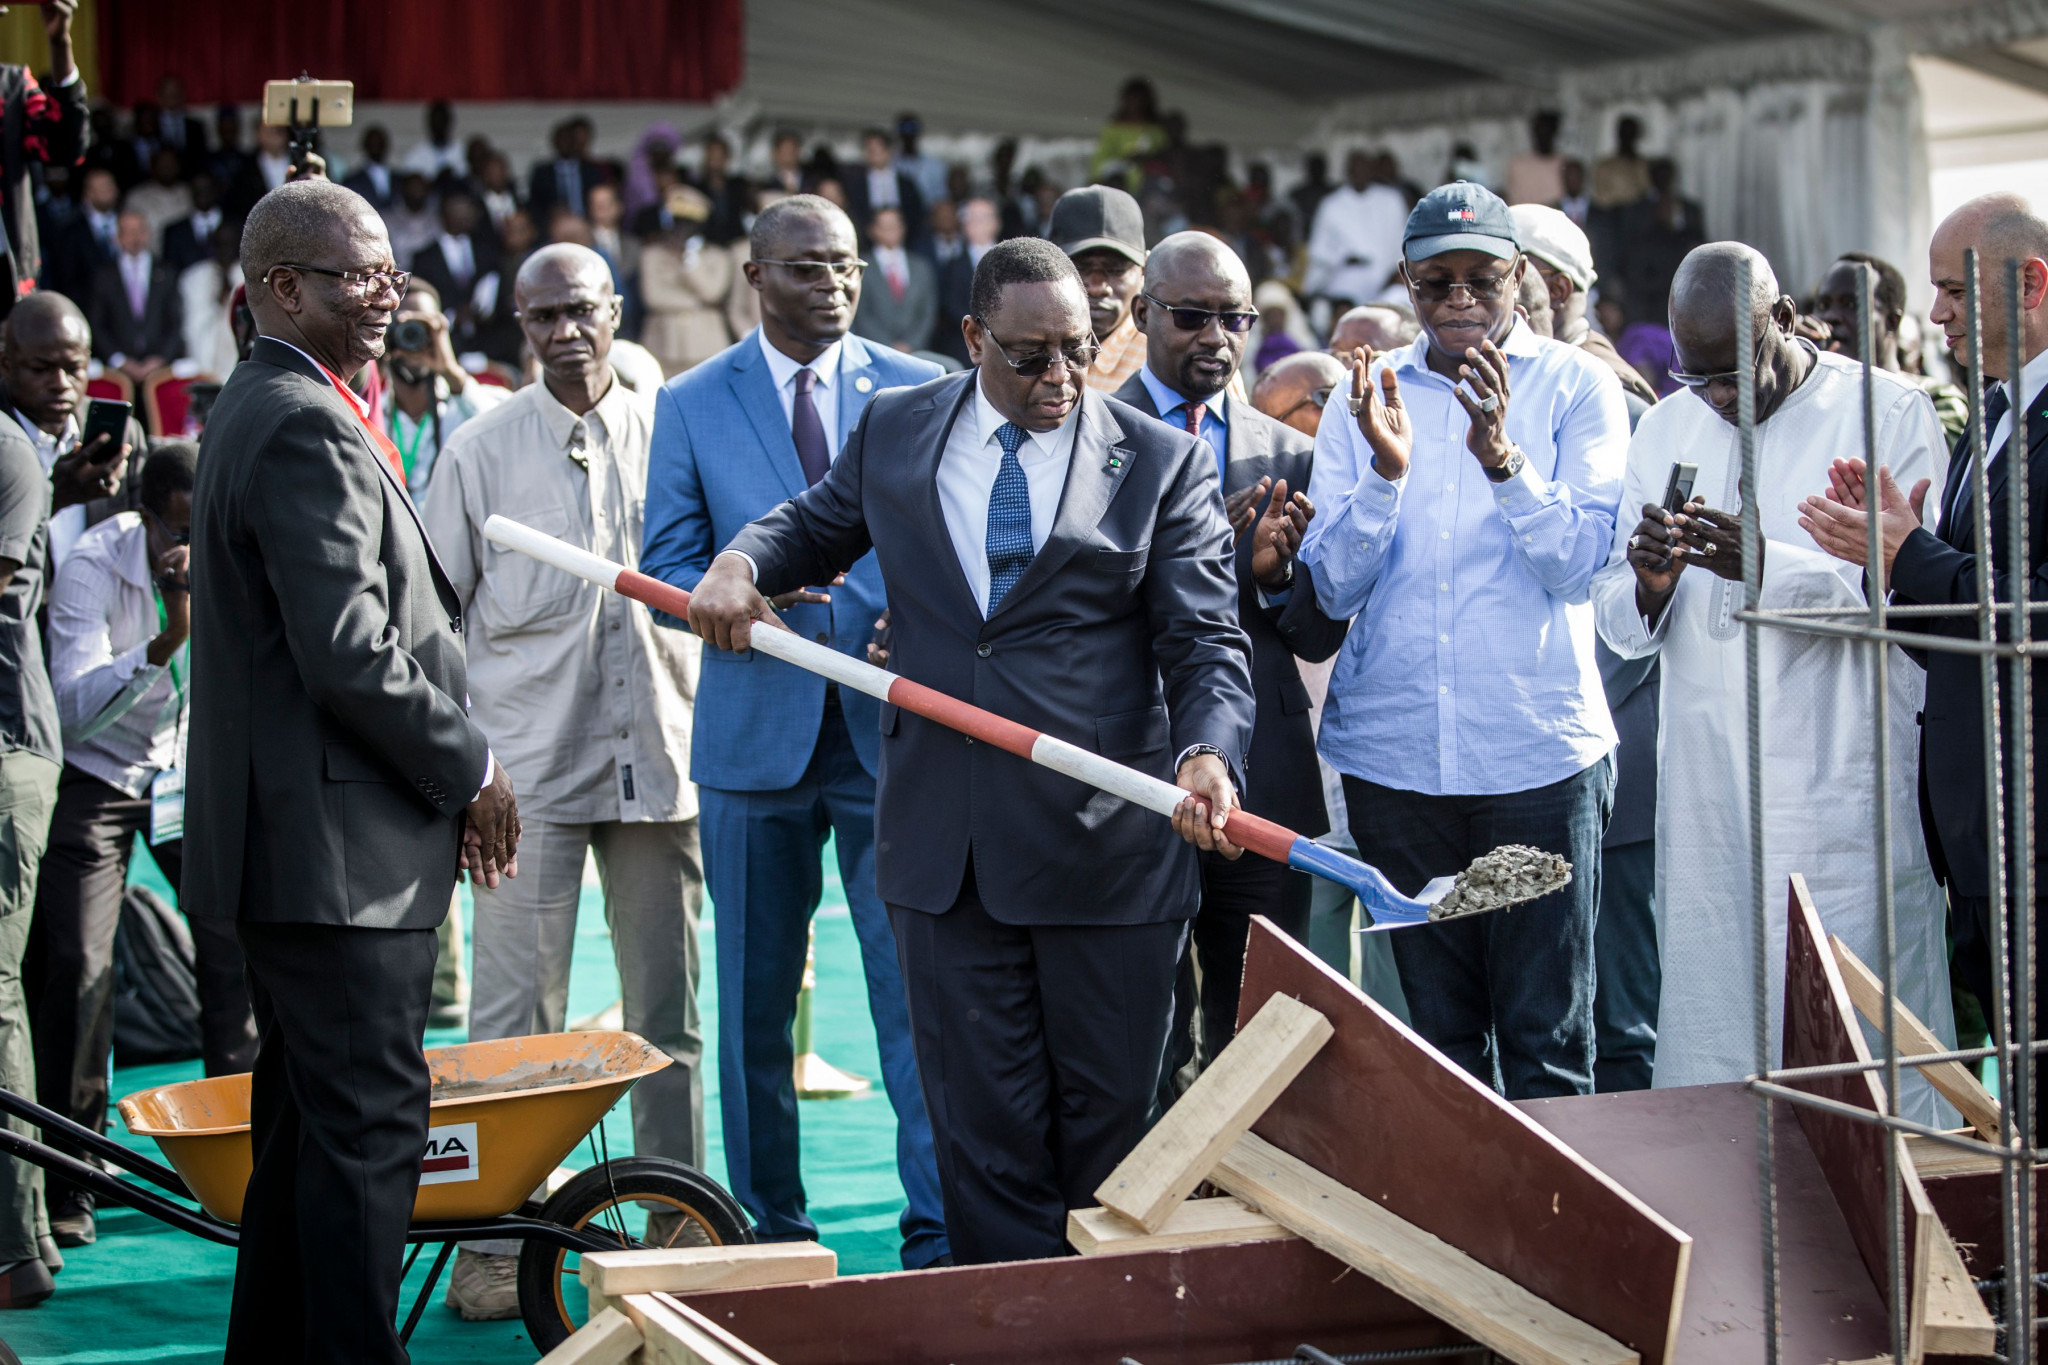 Senegalese President launches construction of 50,000-seat stadium for Dakar 2022